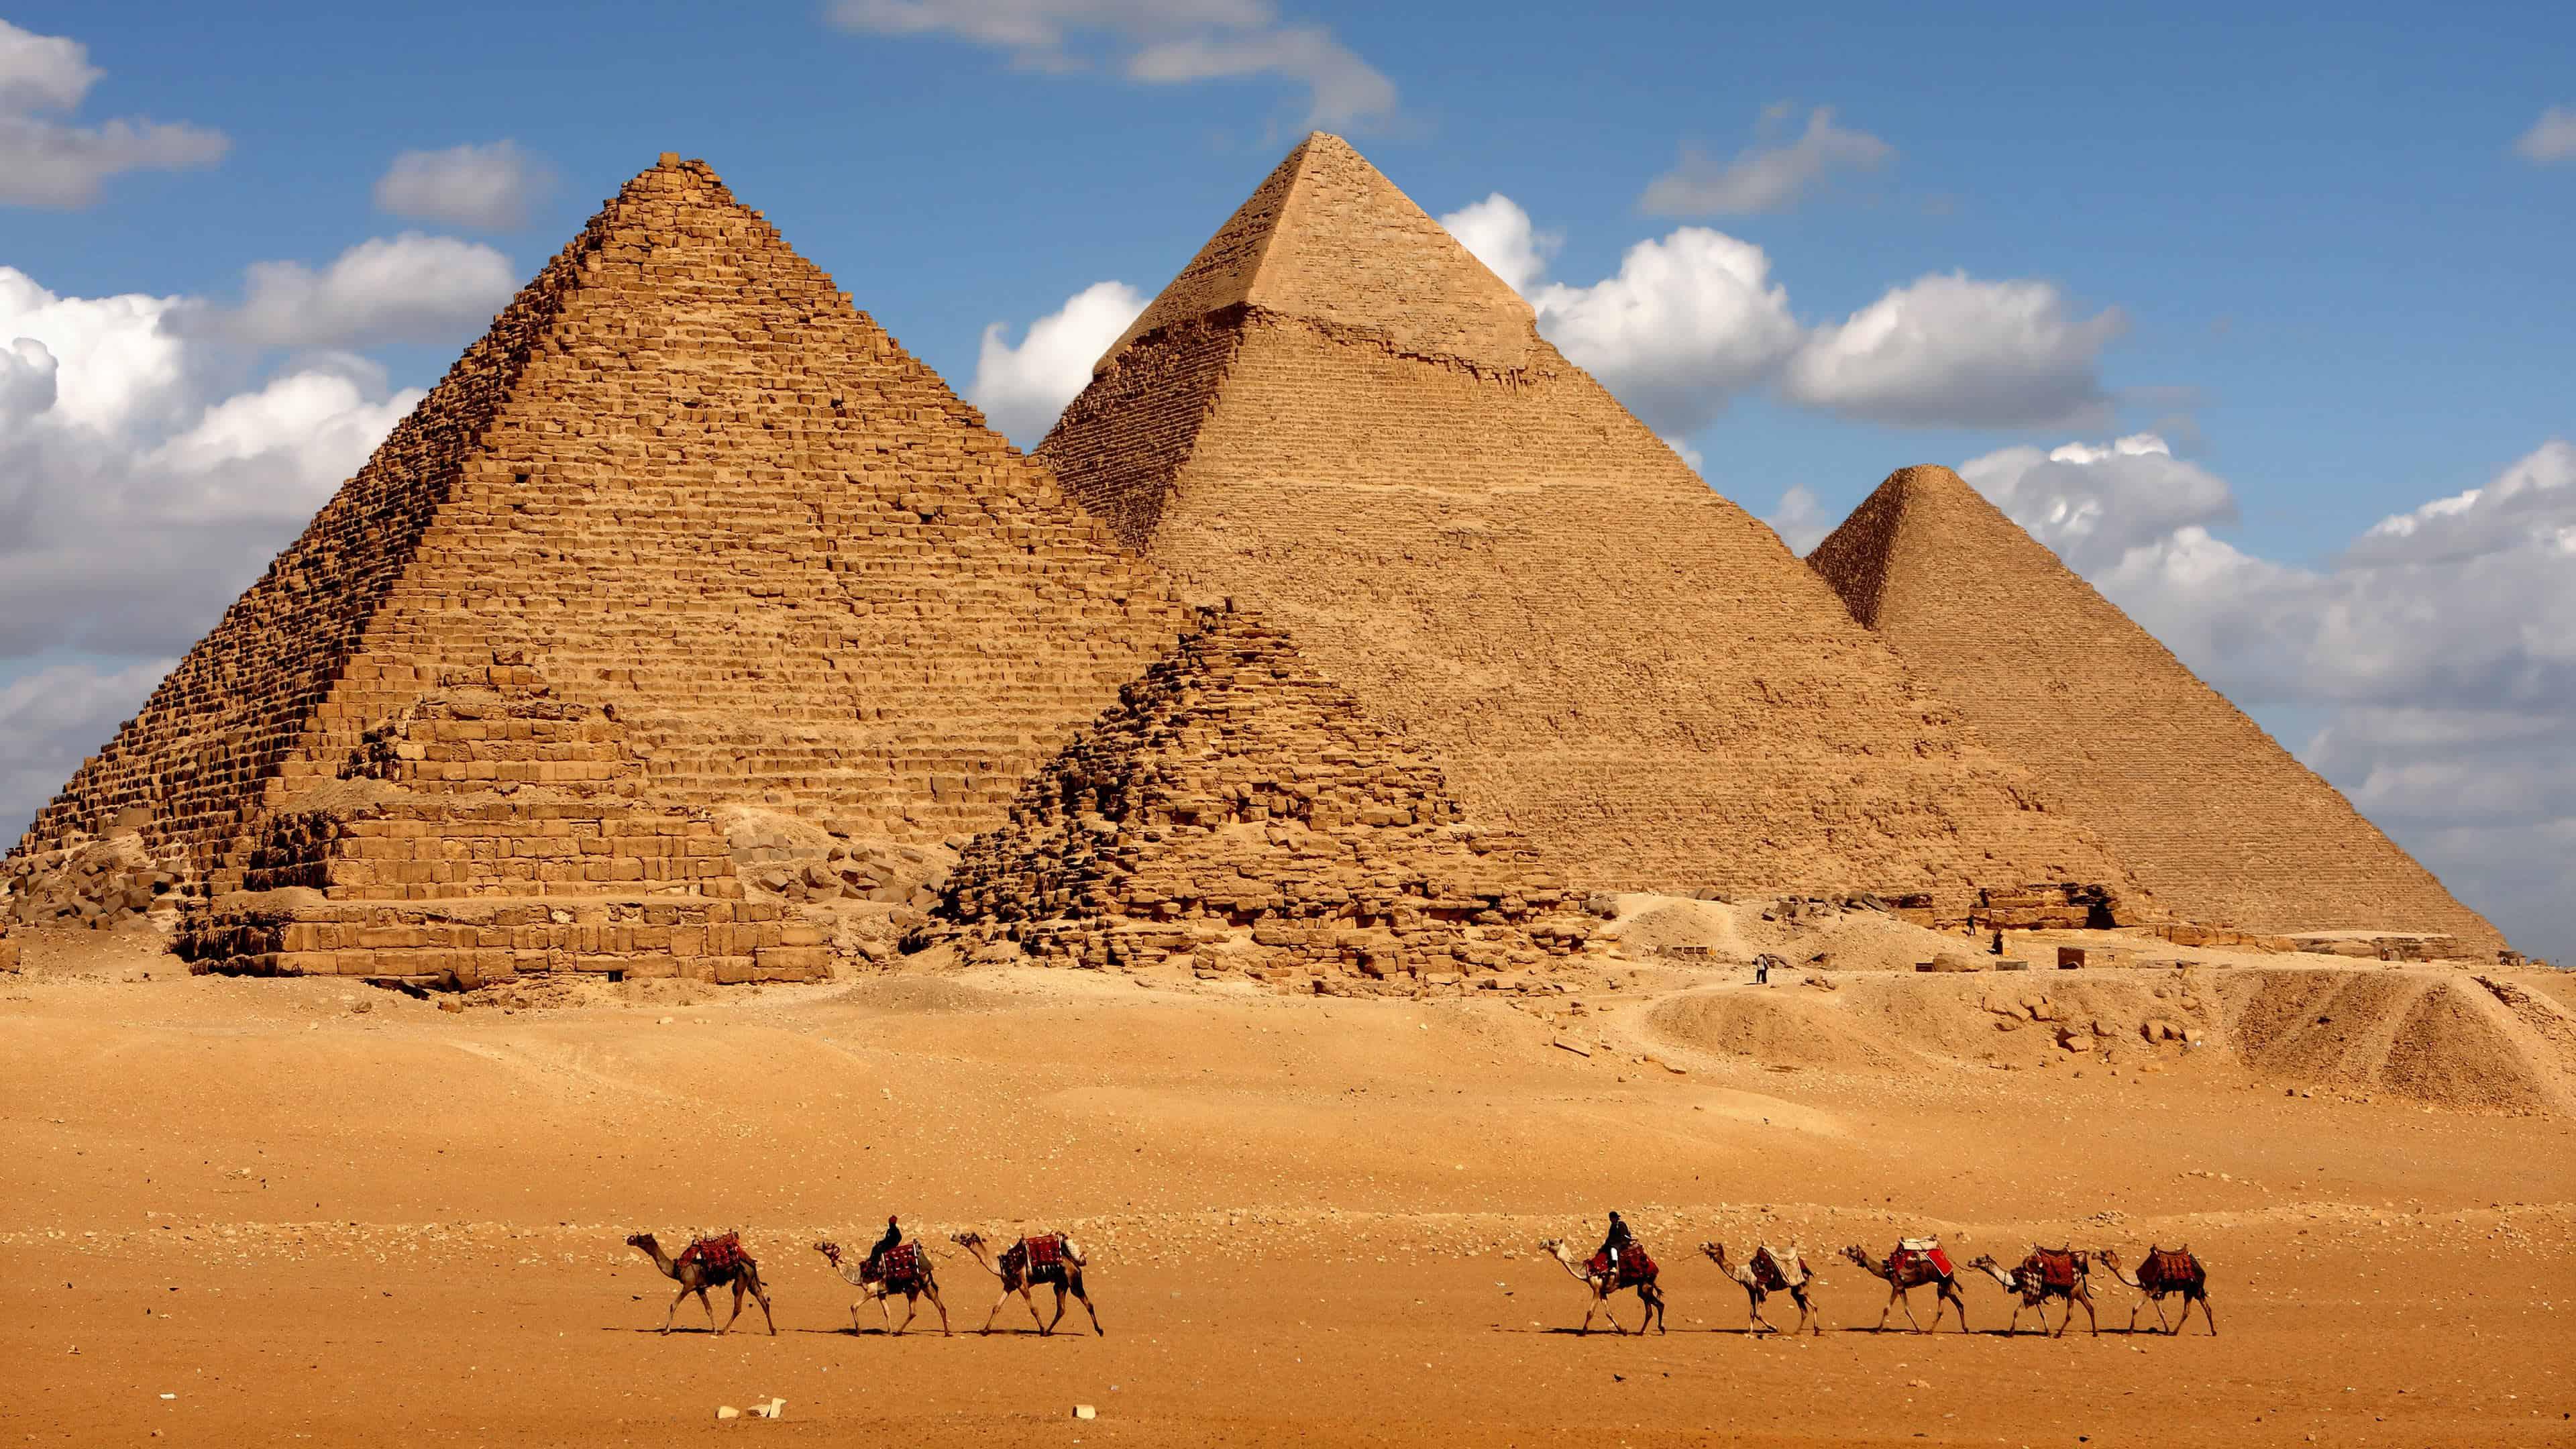 https://pixelz.cc/wp-content/uploads/2018/07/pyramids-and-camels-egypt-uhd-4k-wallpaper.jpg